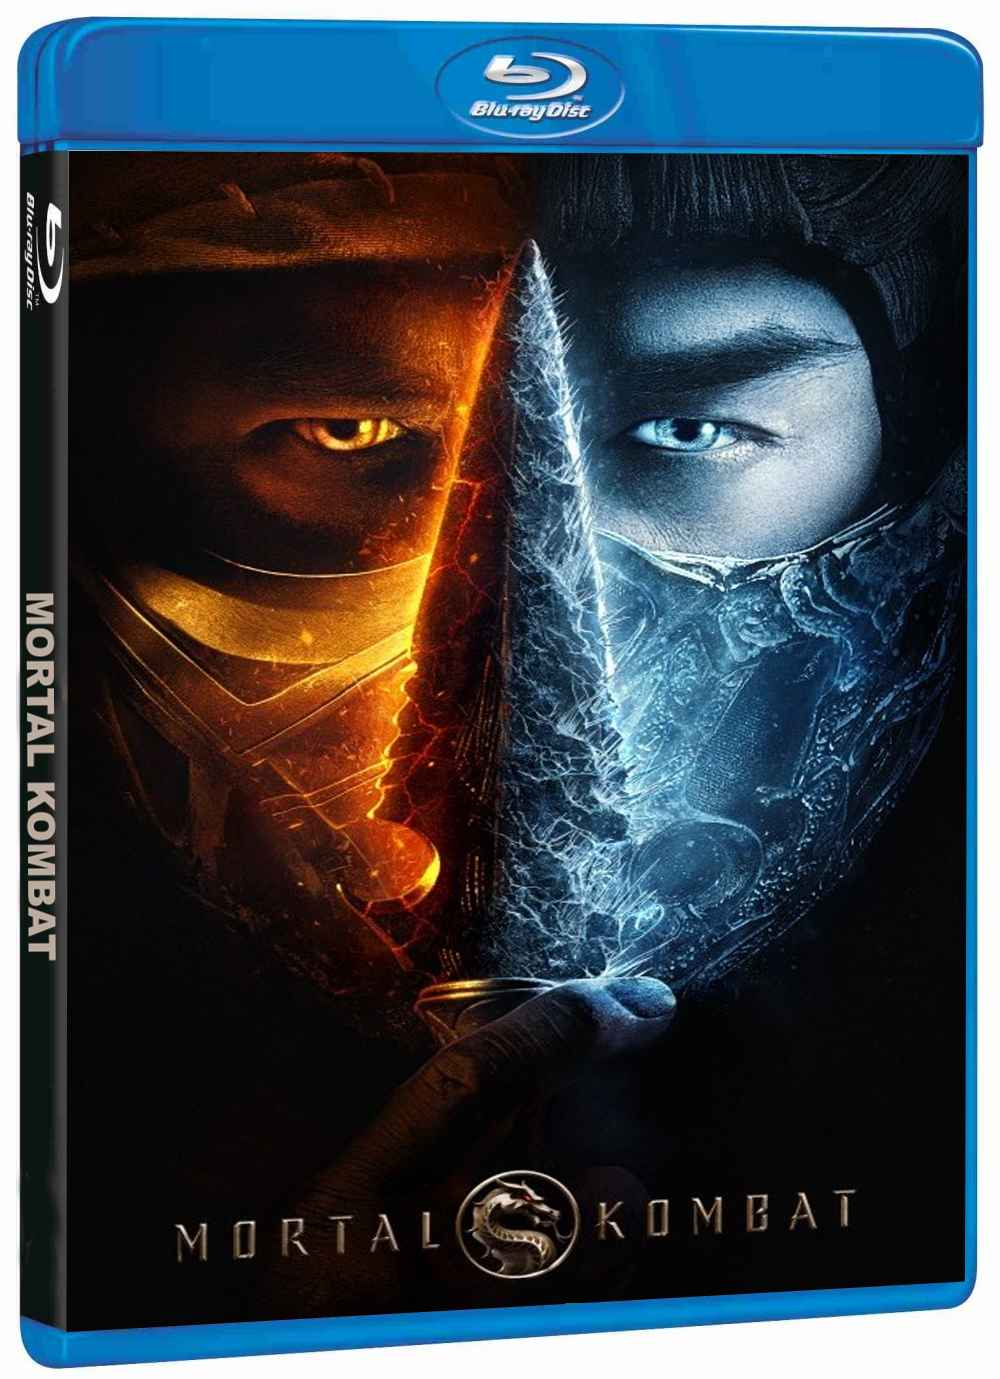 Mortal Kombat - Blu-ray